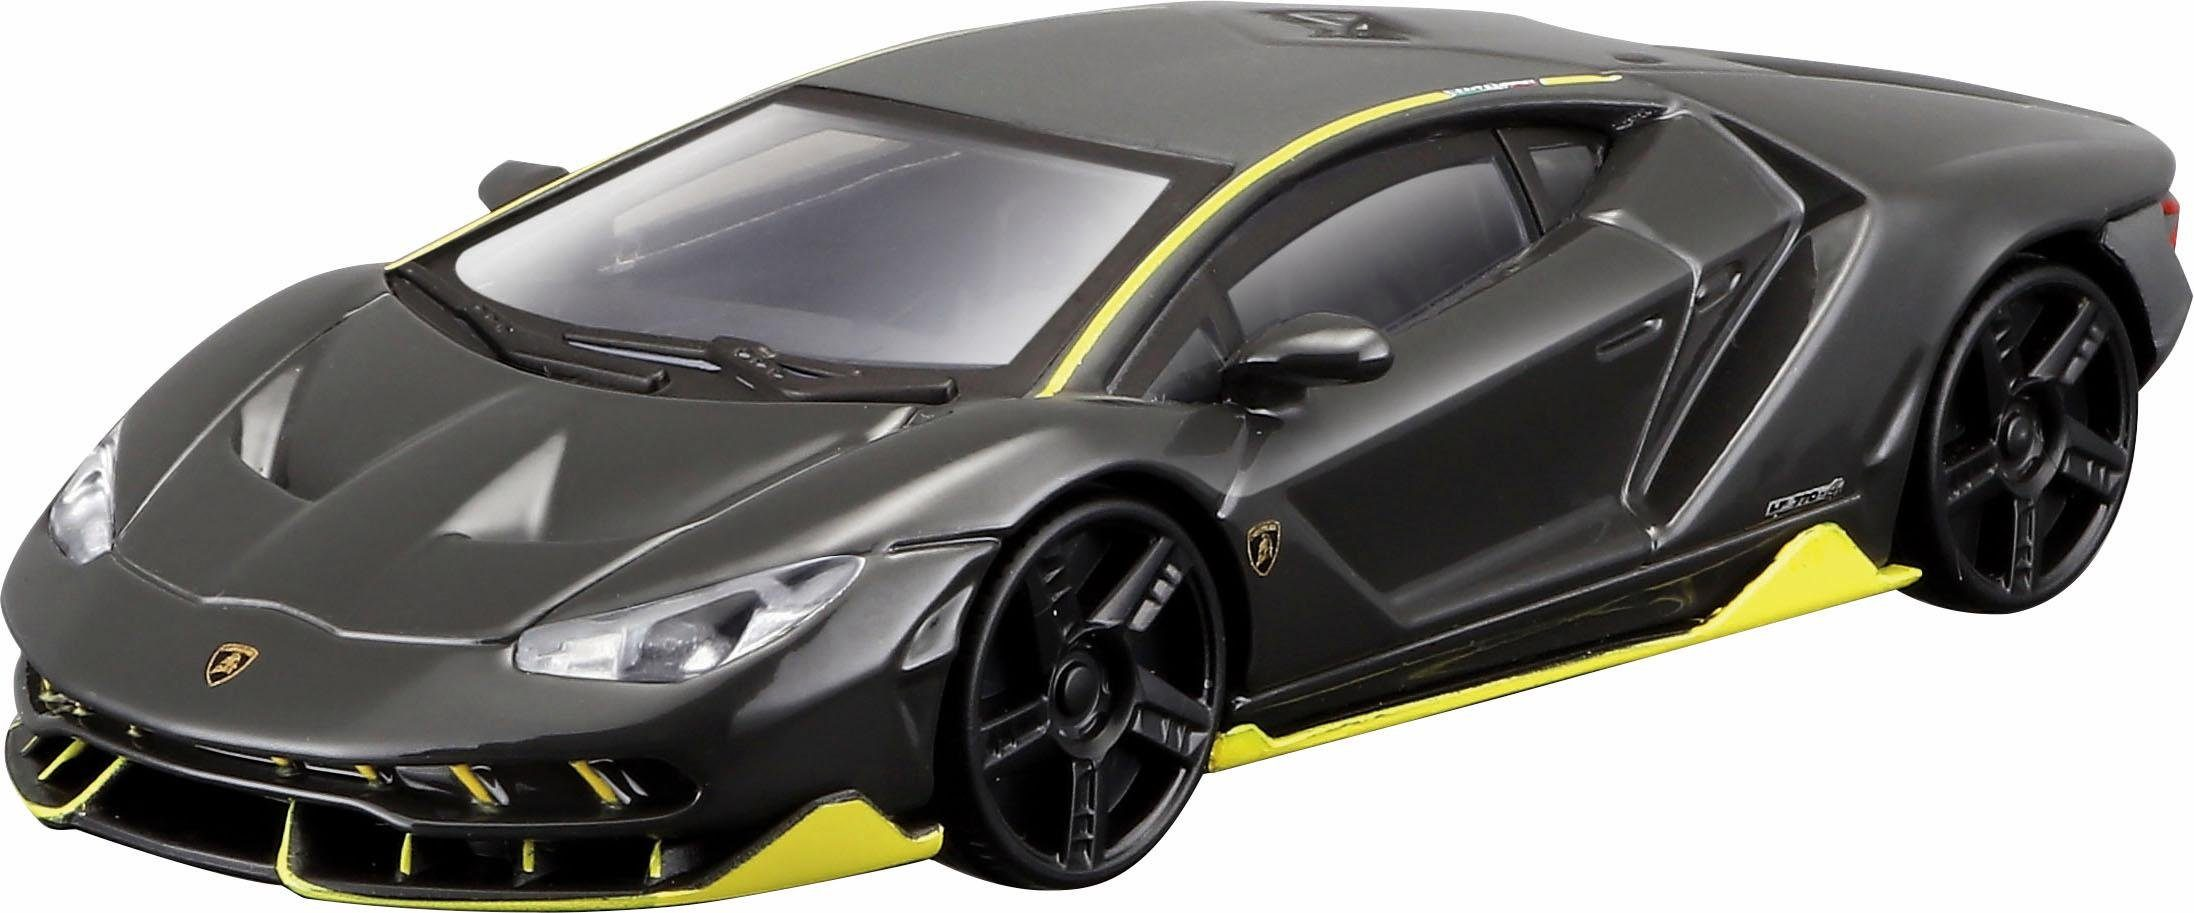 Maisto Tech® RC Komplettset mit Licht, »R/C Lamborghini Centenario, 1:14, schwarz«